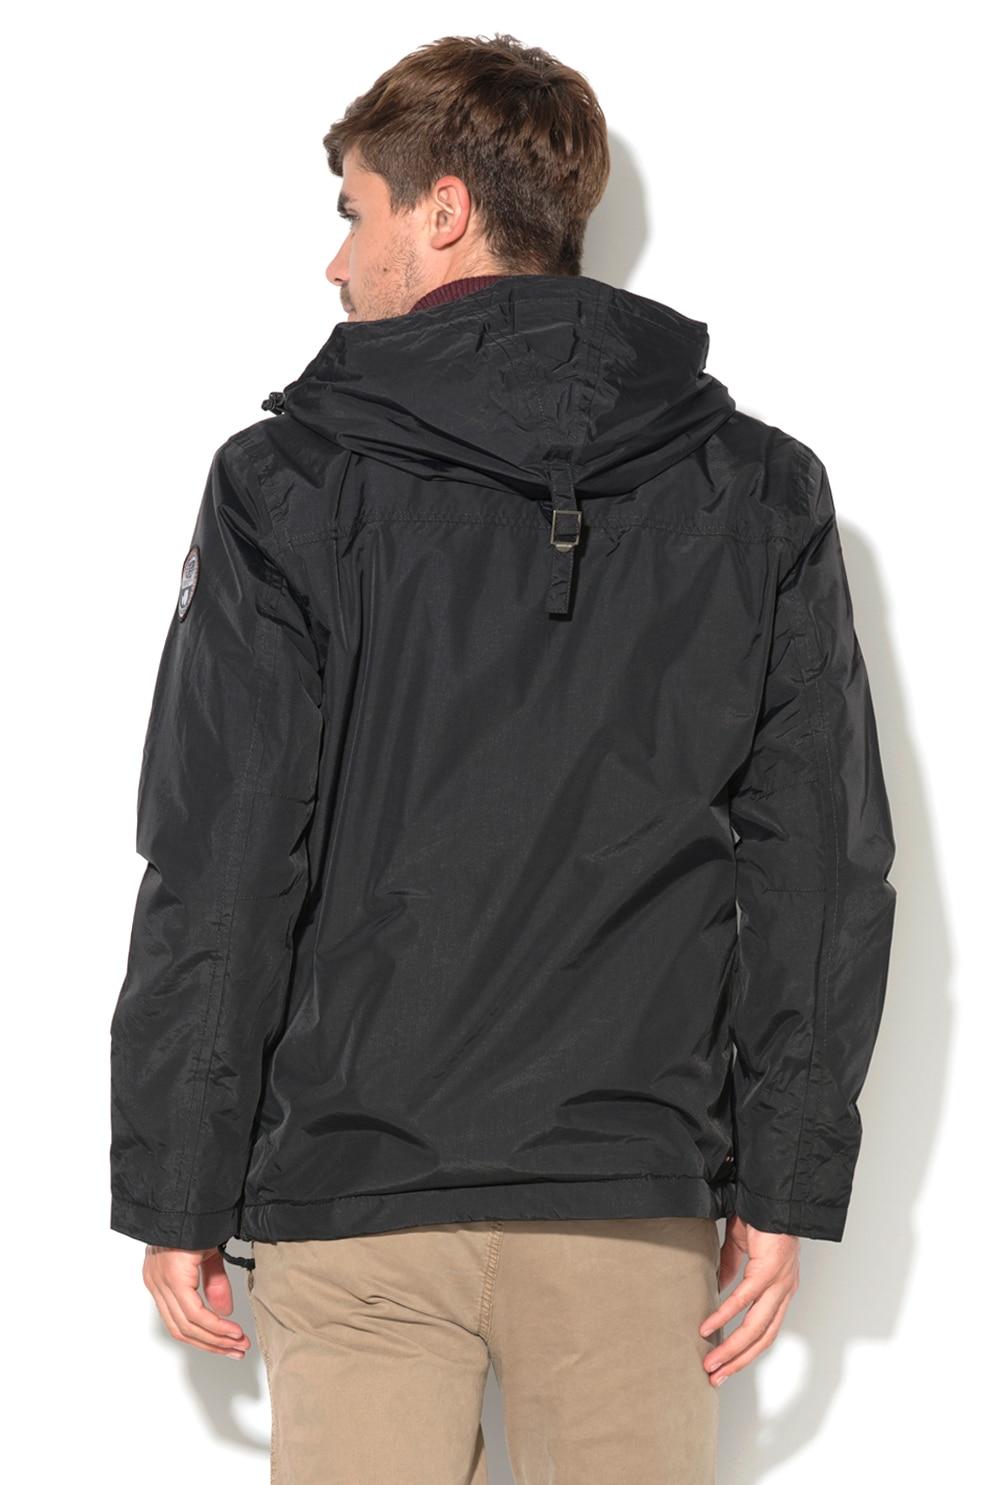 Napapijri, Rainforest bebújós kapucnis télikabát, Fekete, M